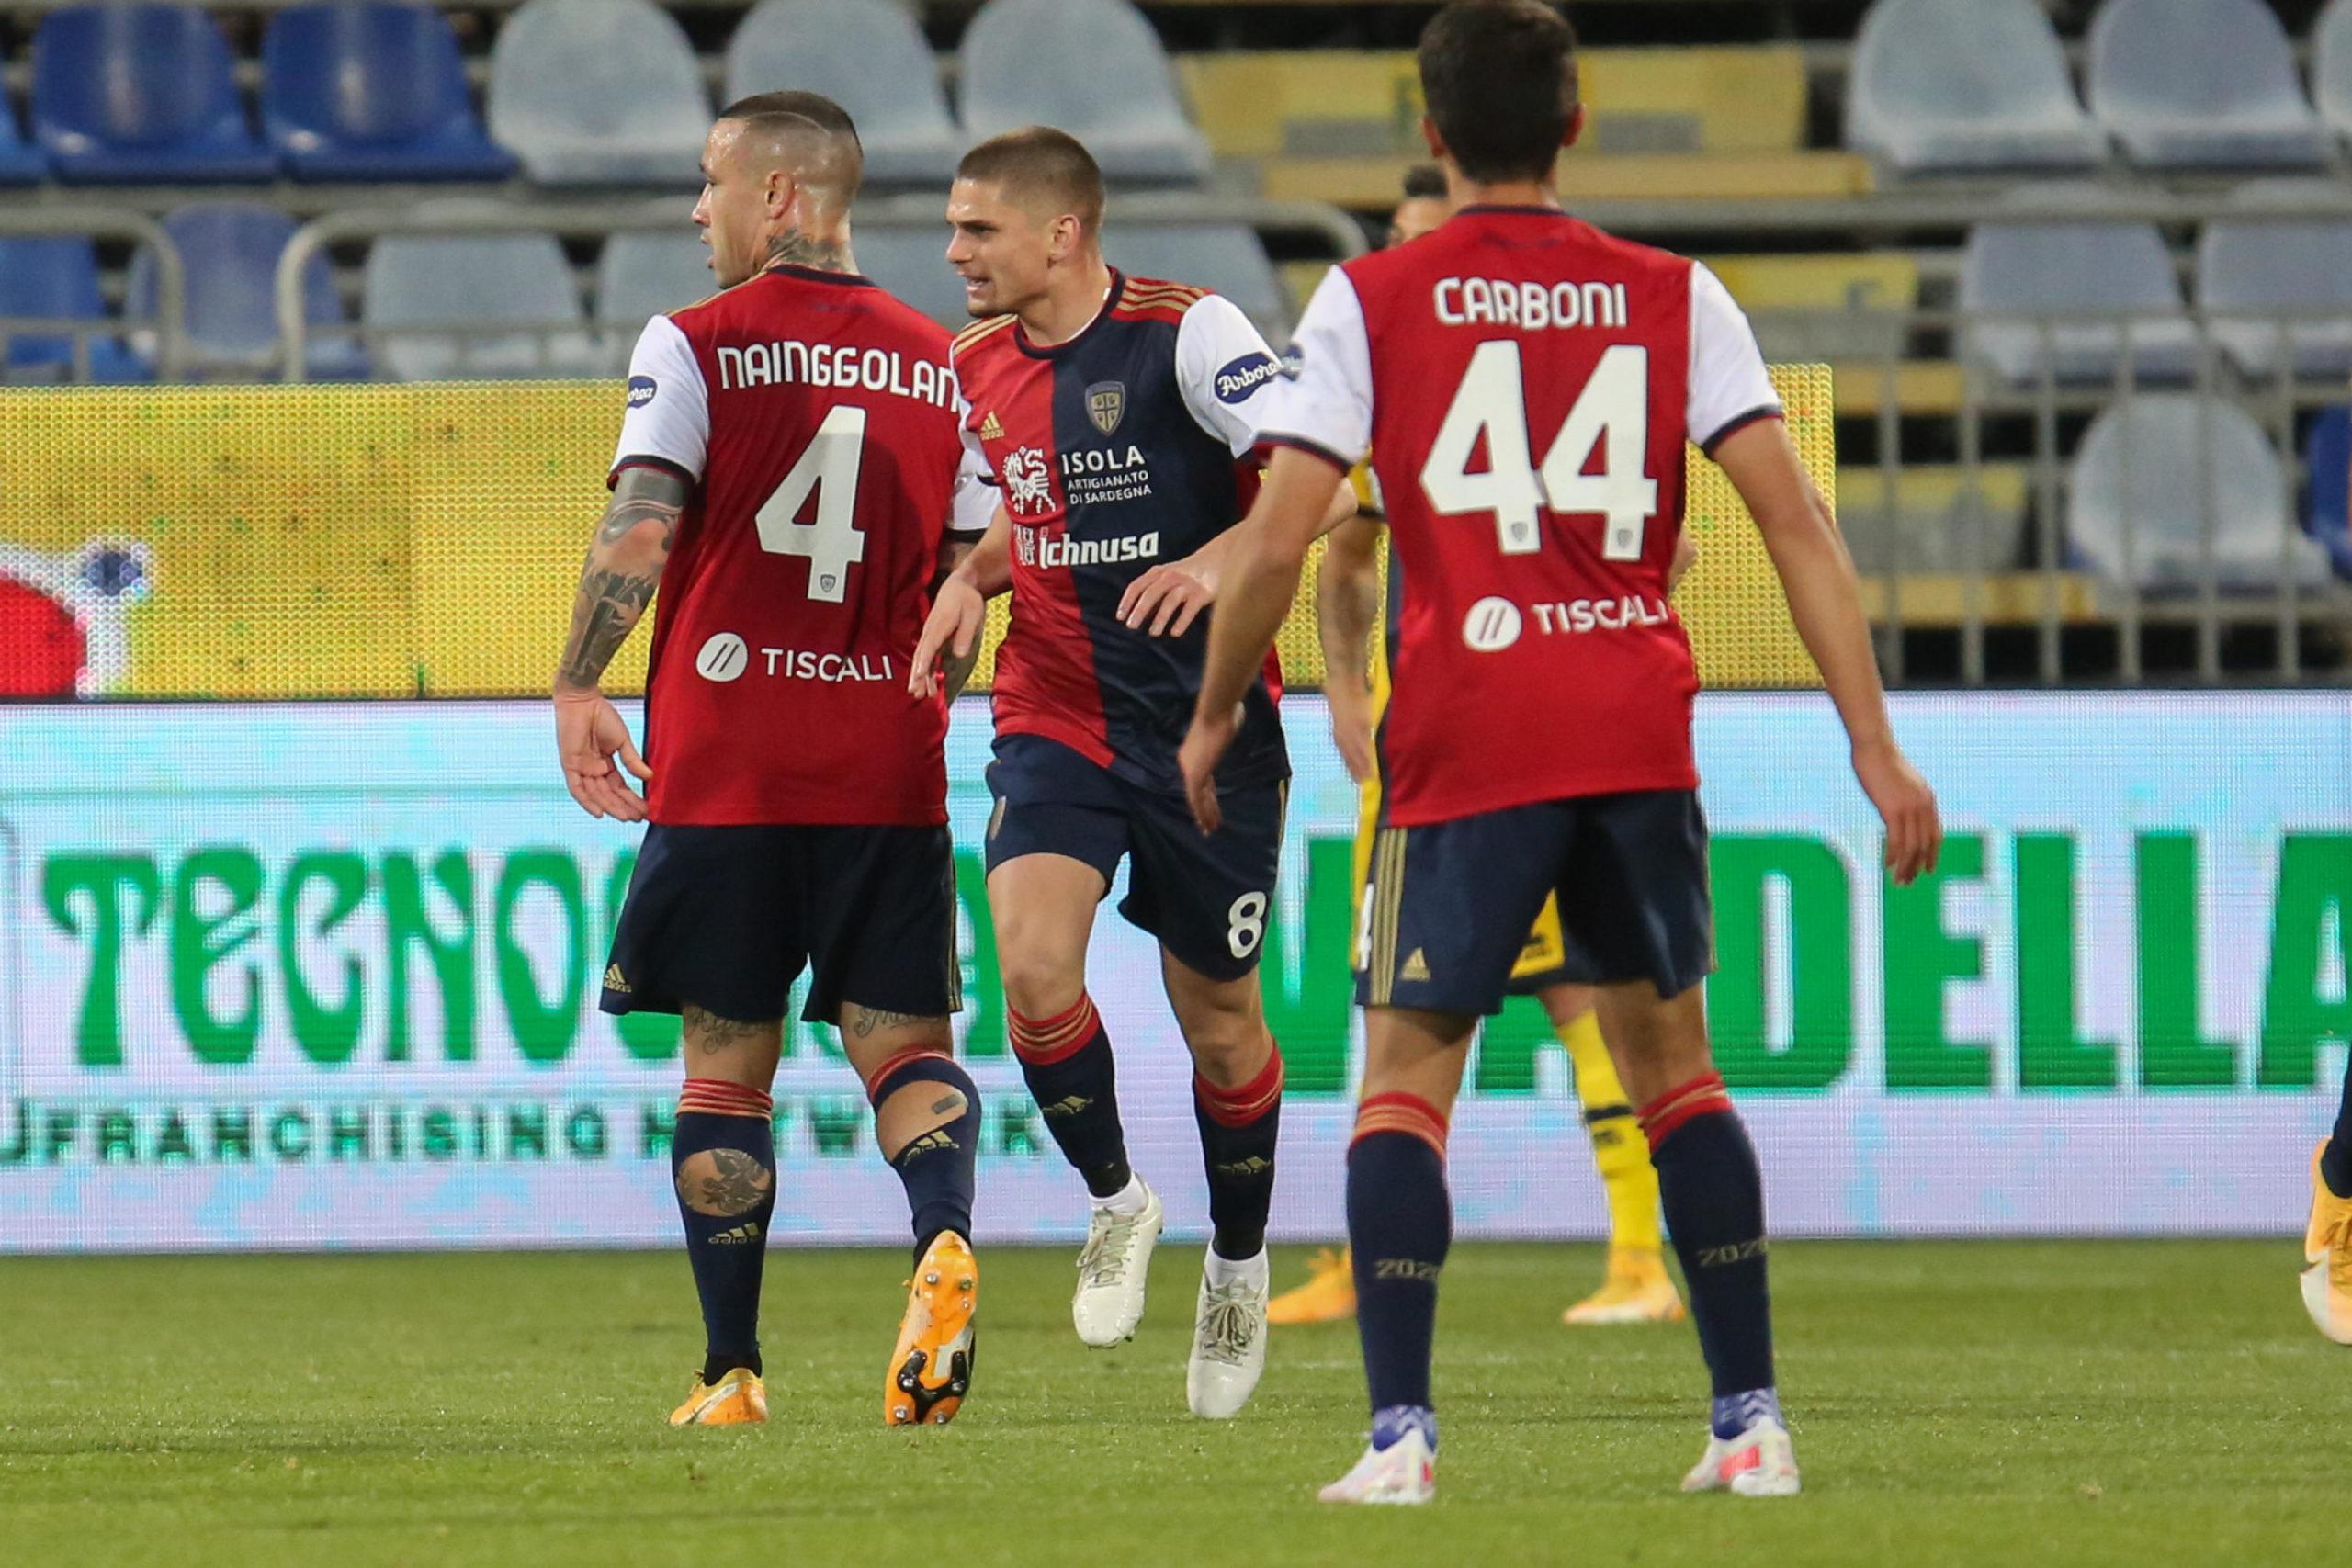 Razvan Marin celebrates a goal for Cagliari against Parma